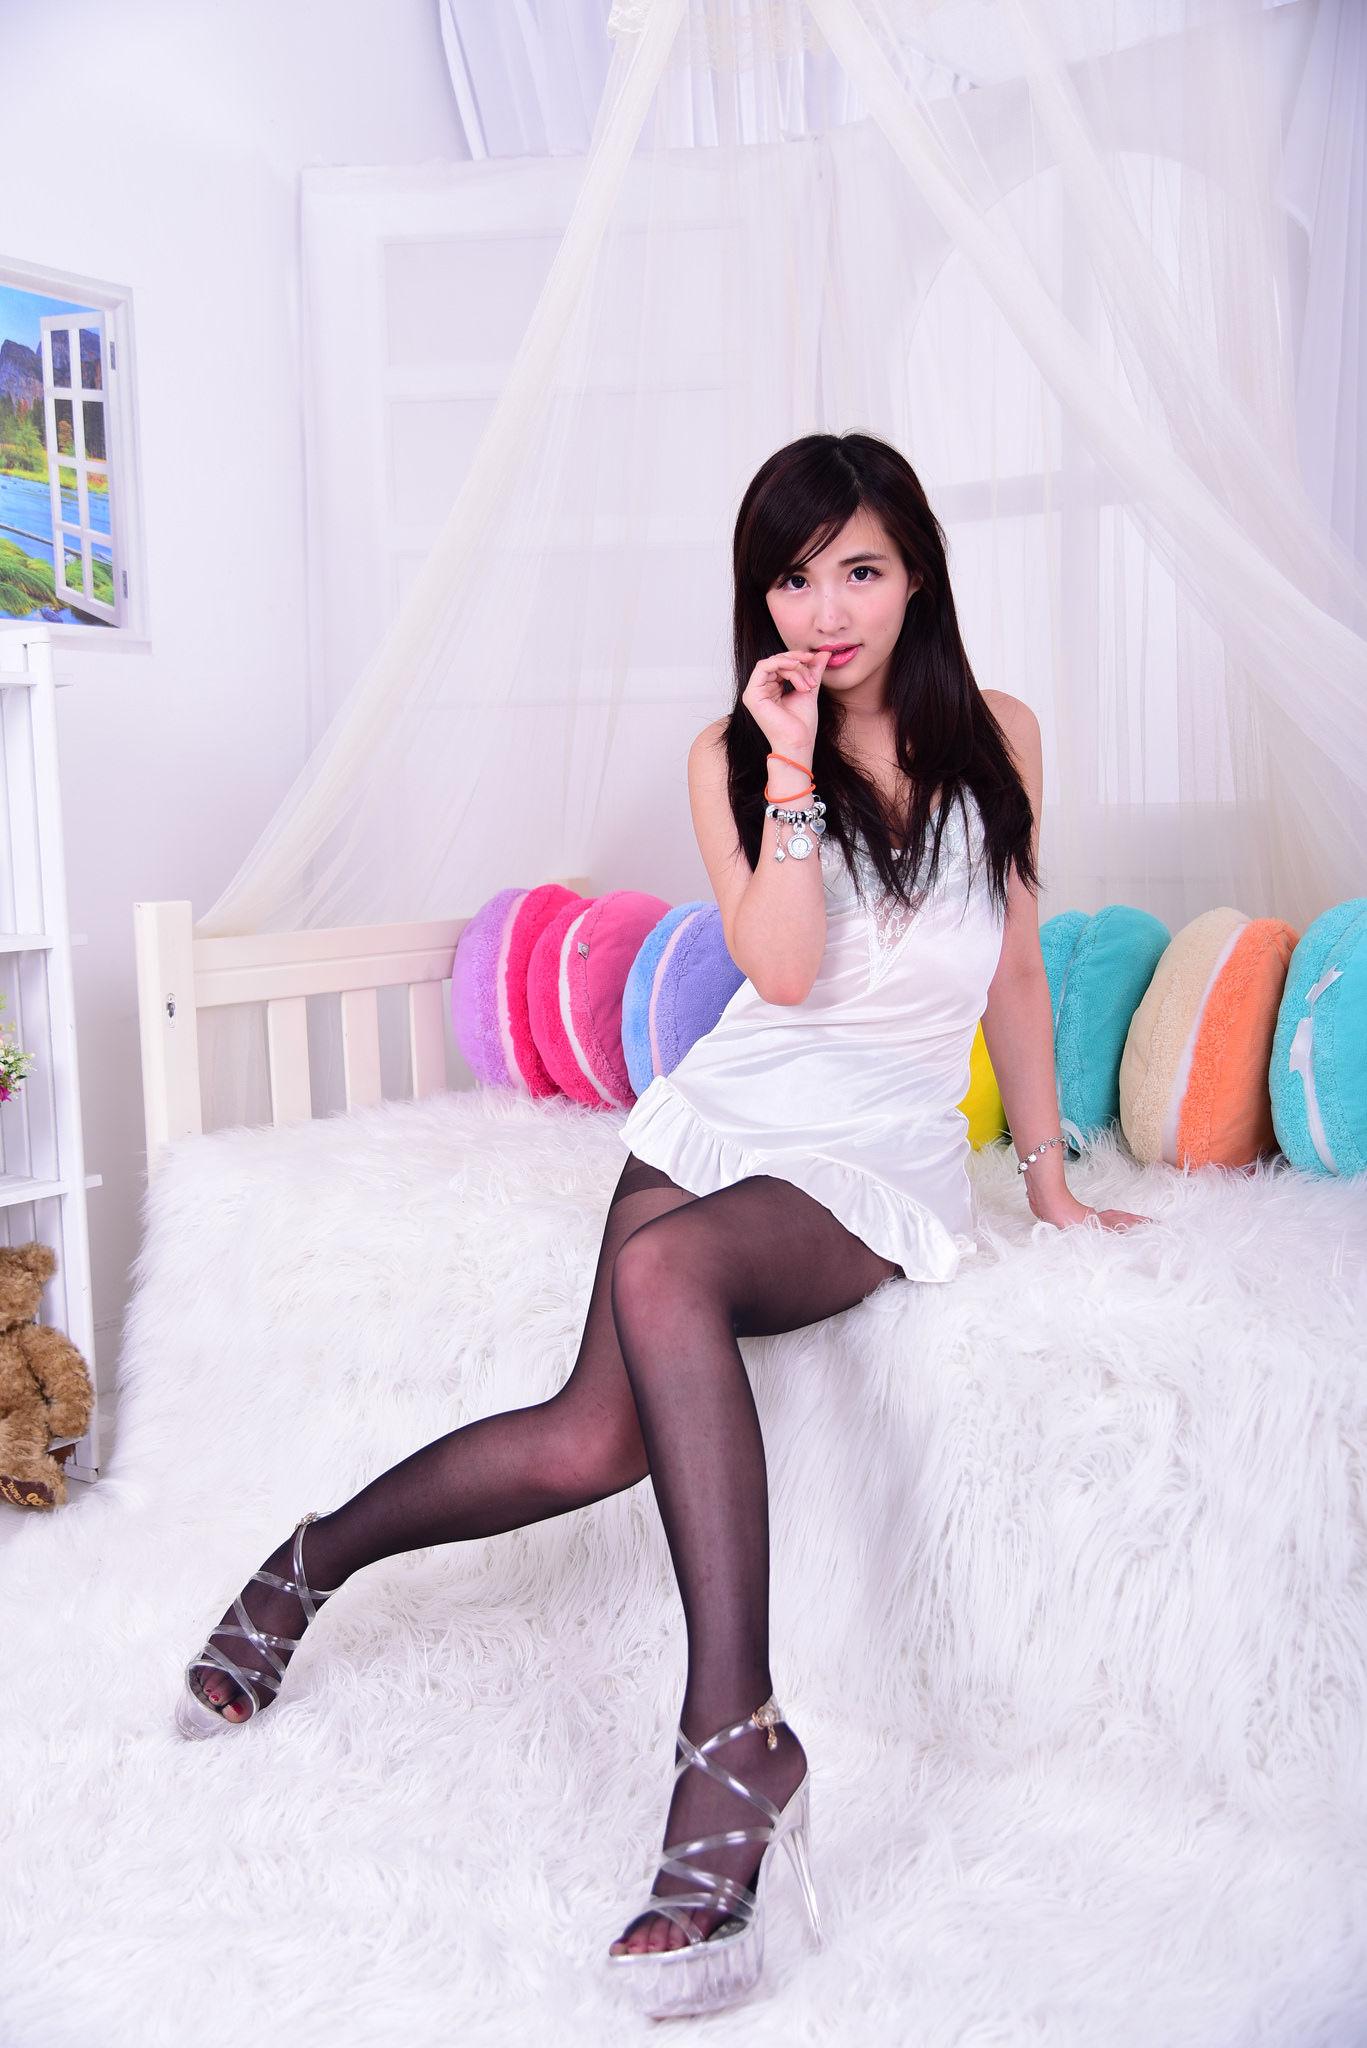 VOL.1394 [台湾正妹]丝袜美女妹子:薇薇超高清个人性感漂亮大图(38P)